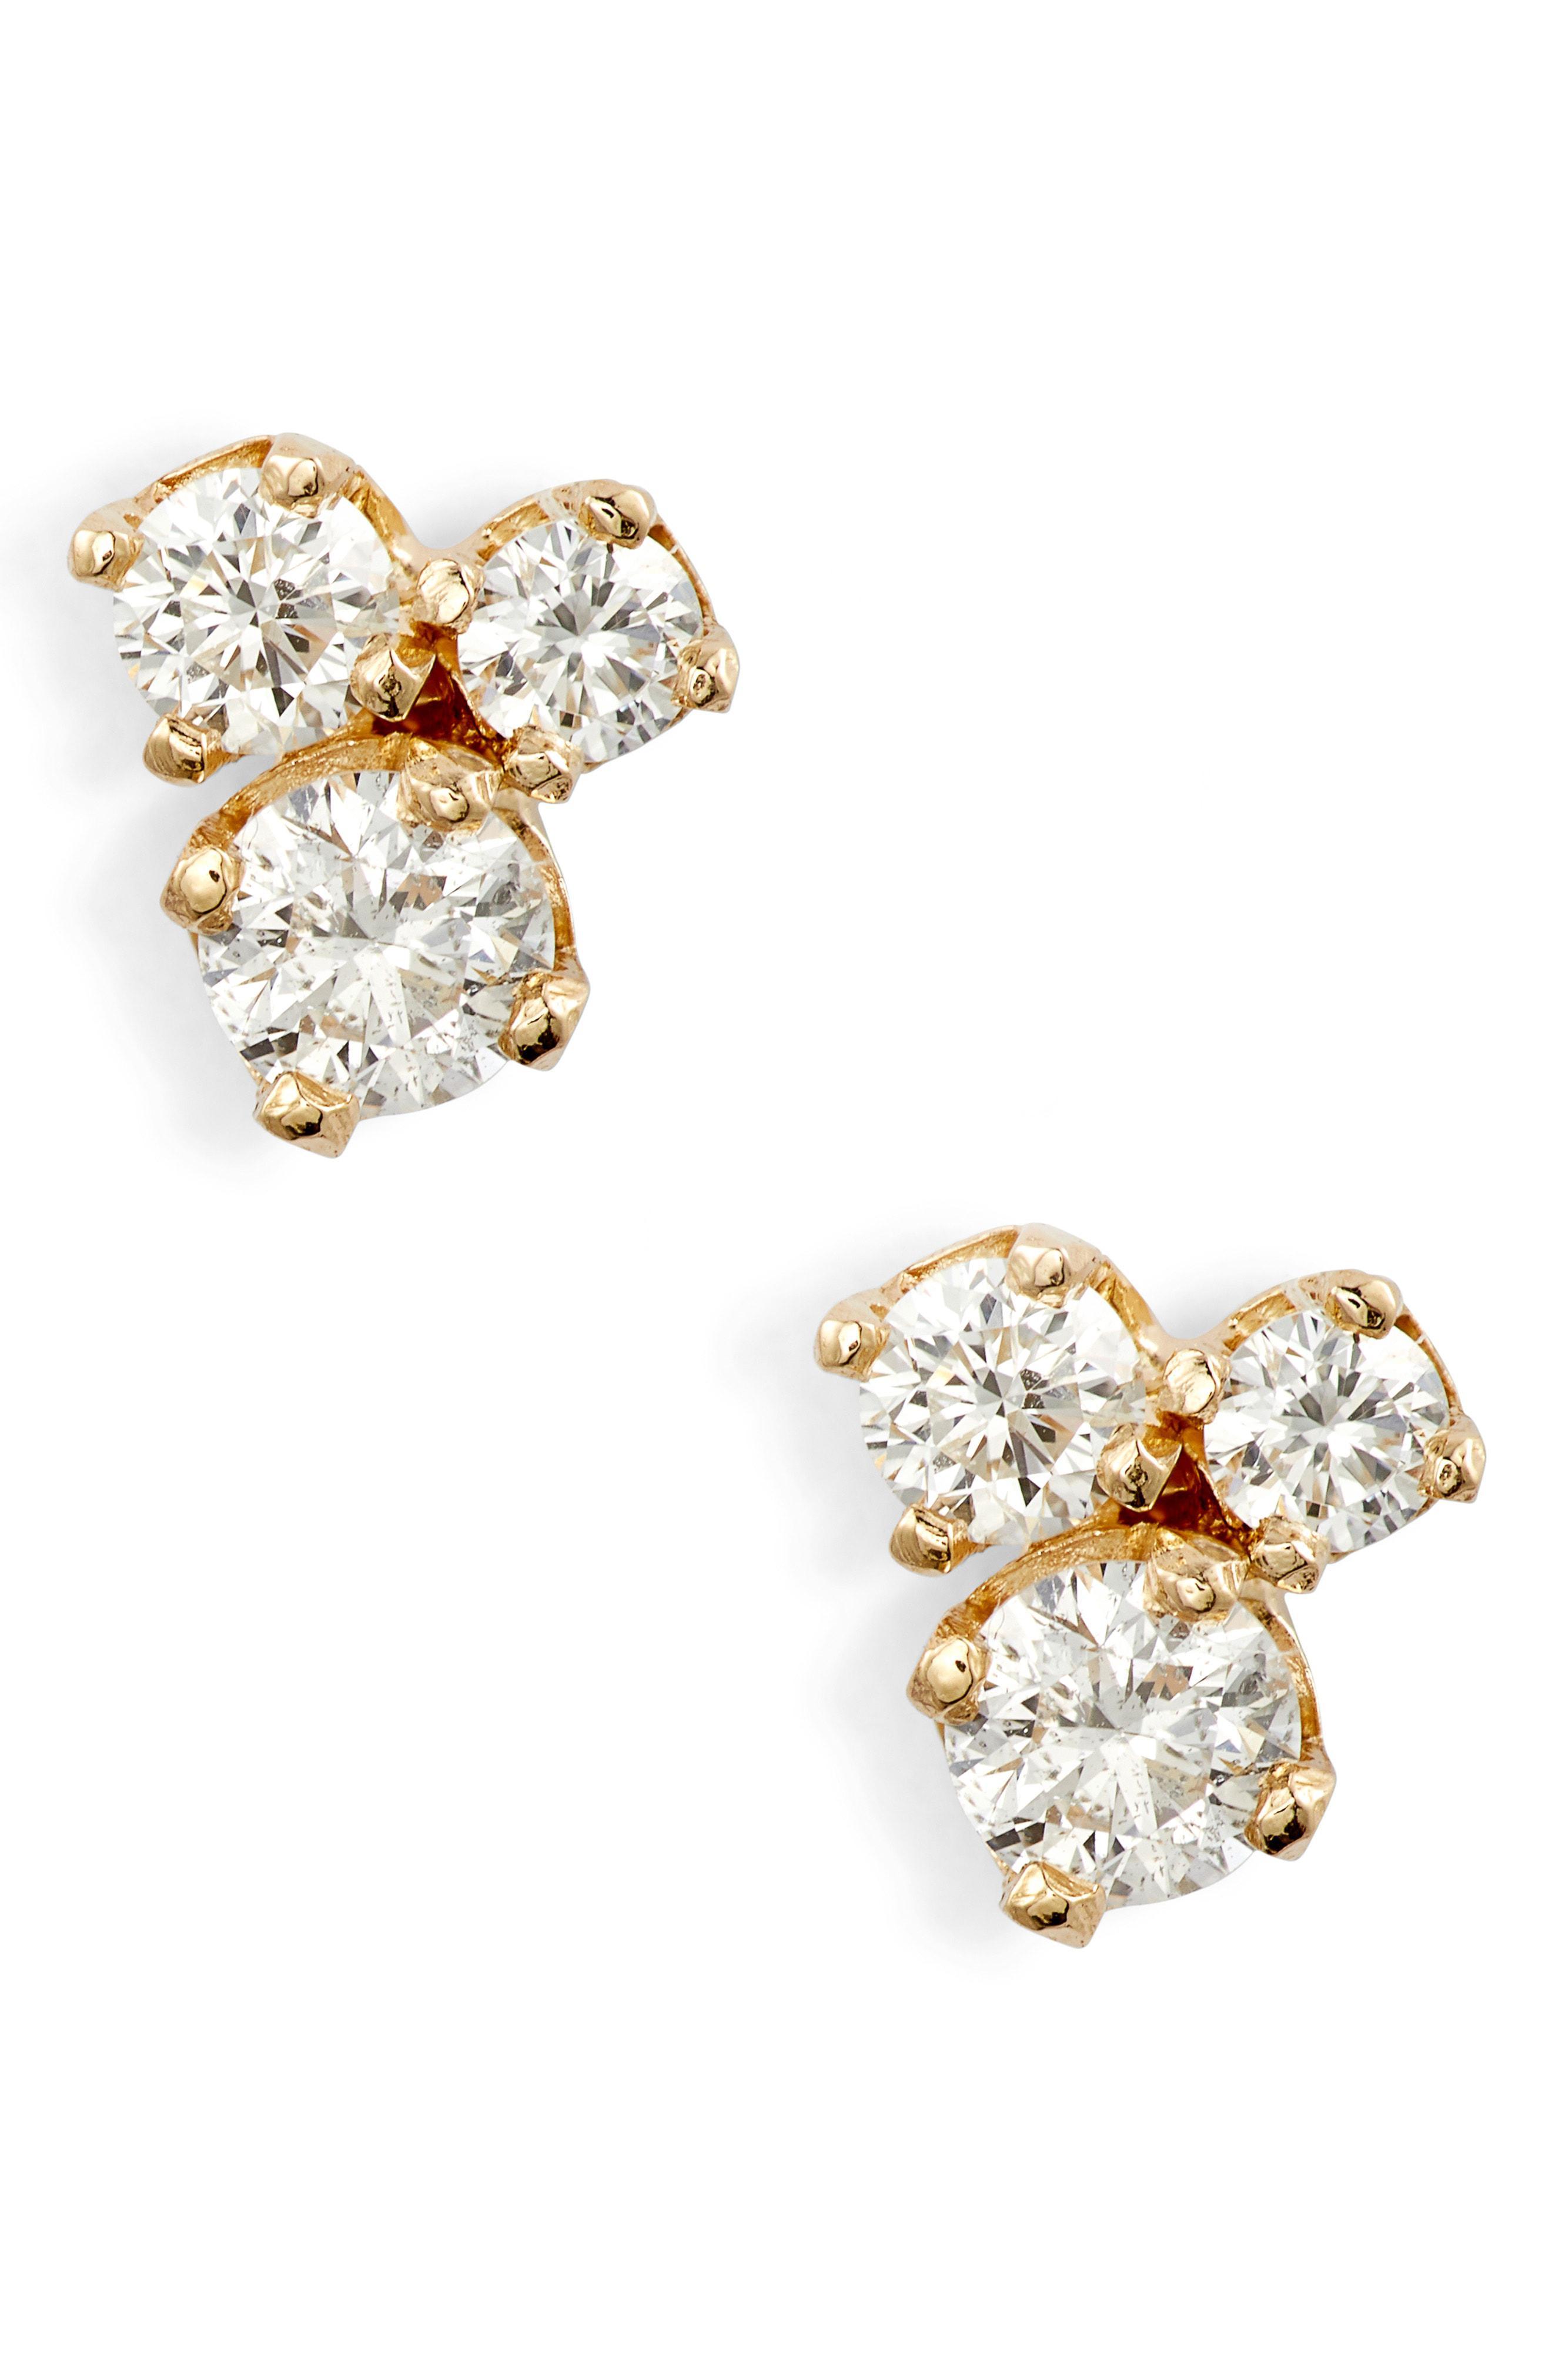 996dbd6d8 Lyst - Zoe Chicco Three-diamond Prong Stud Earrings in Metallic